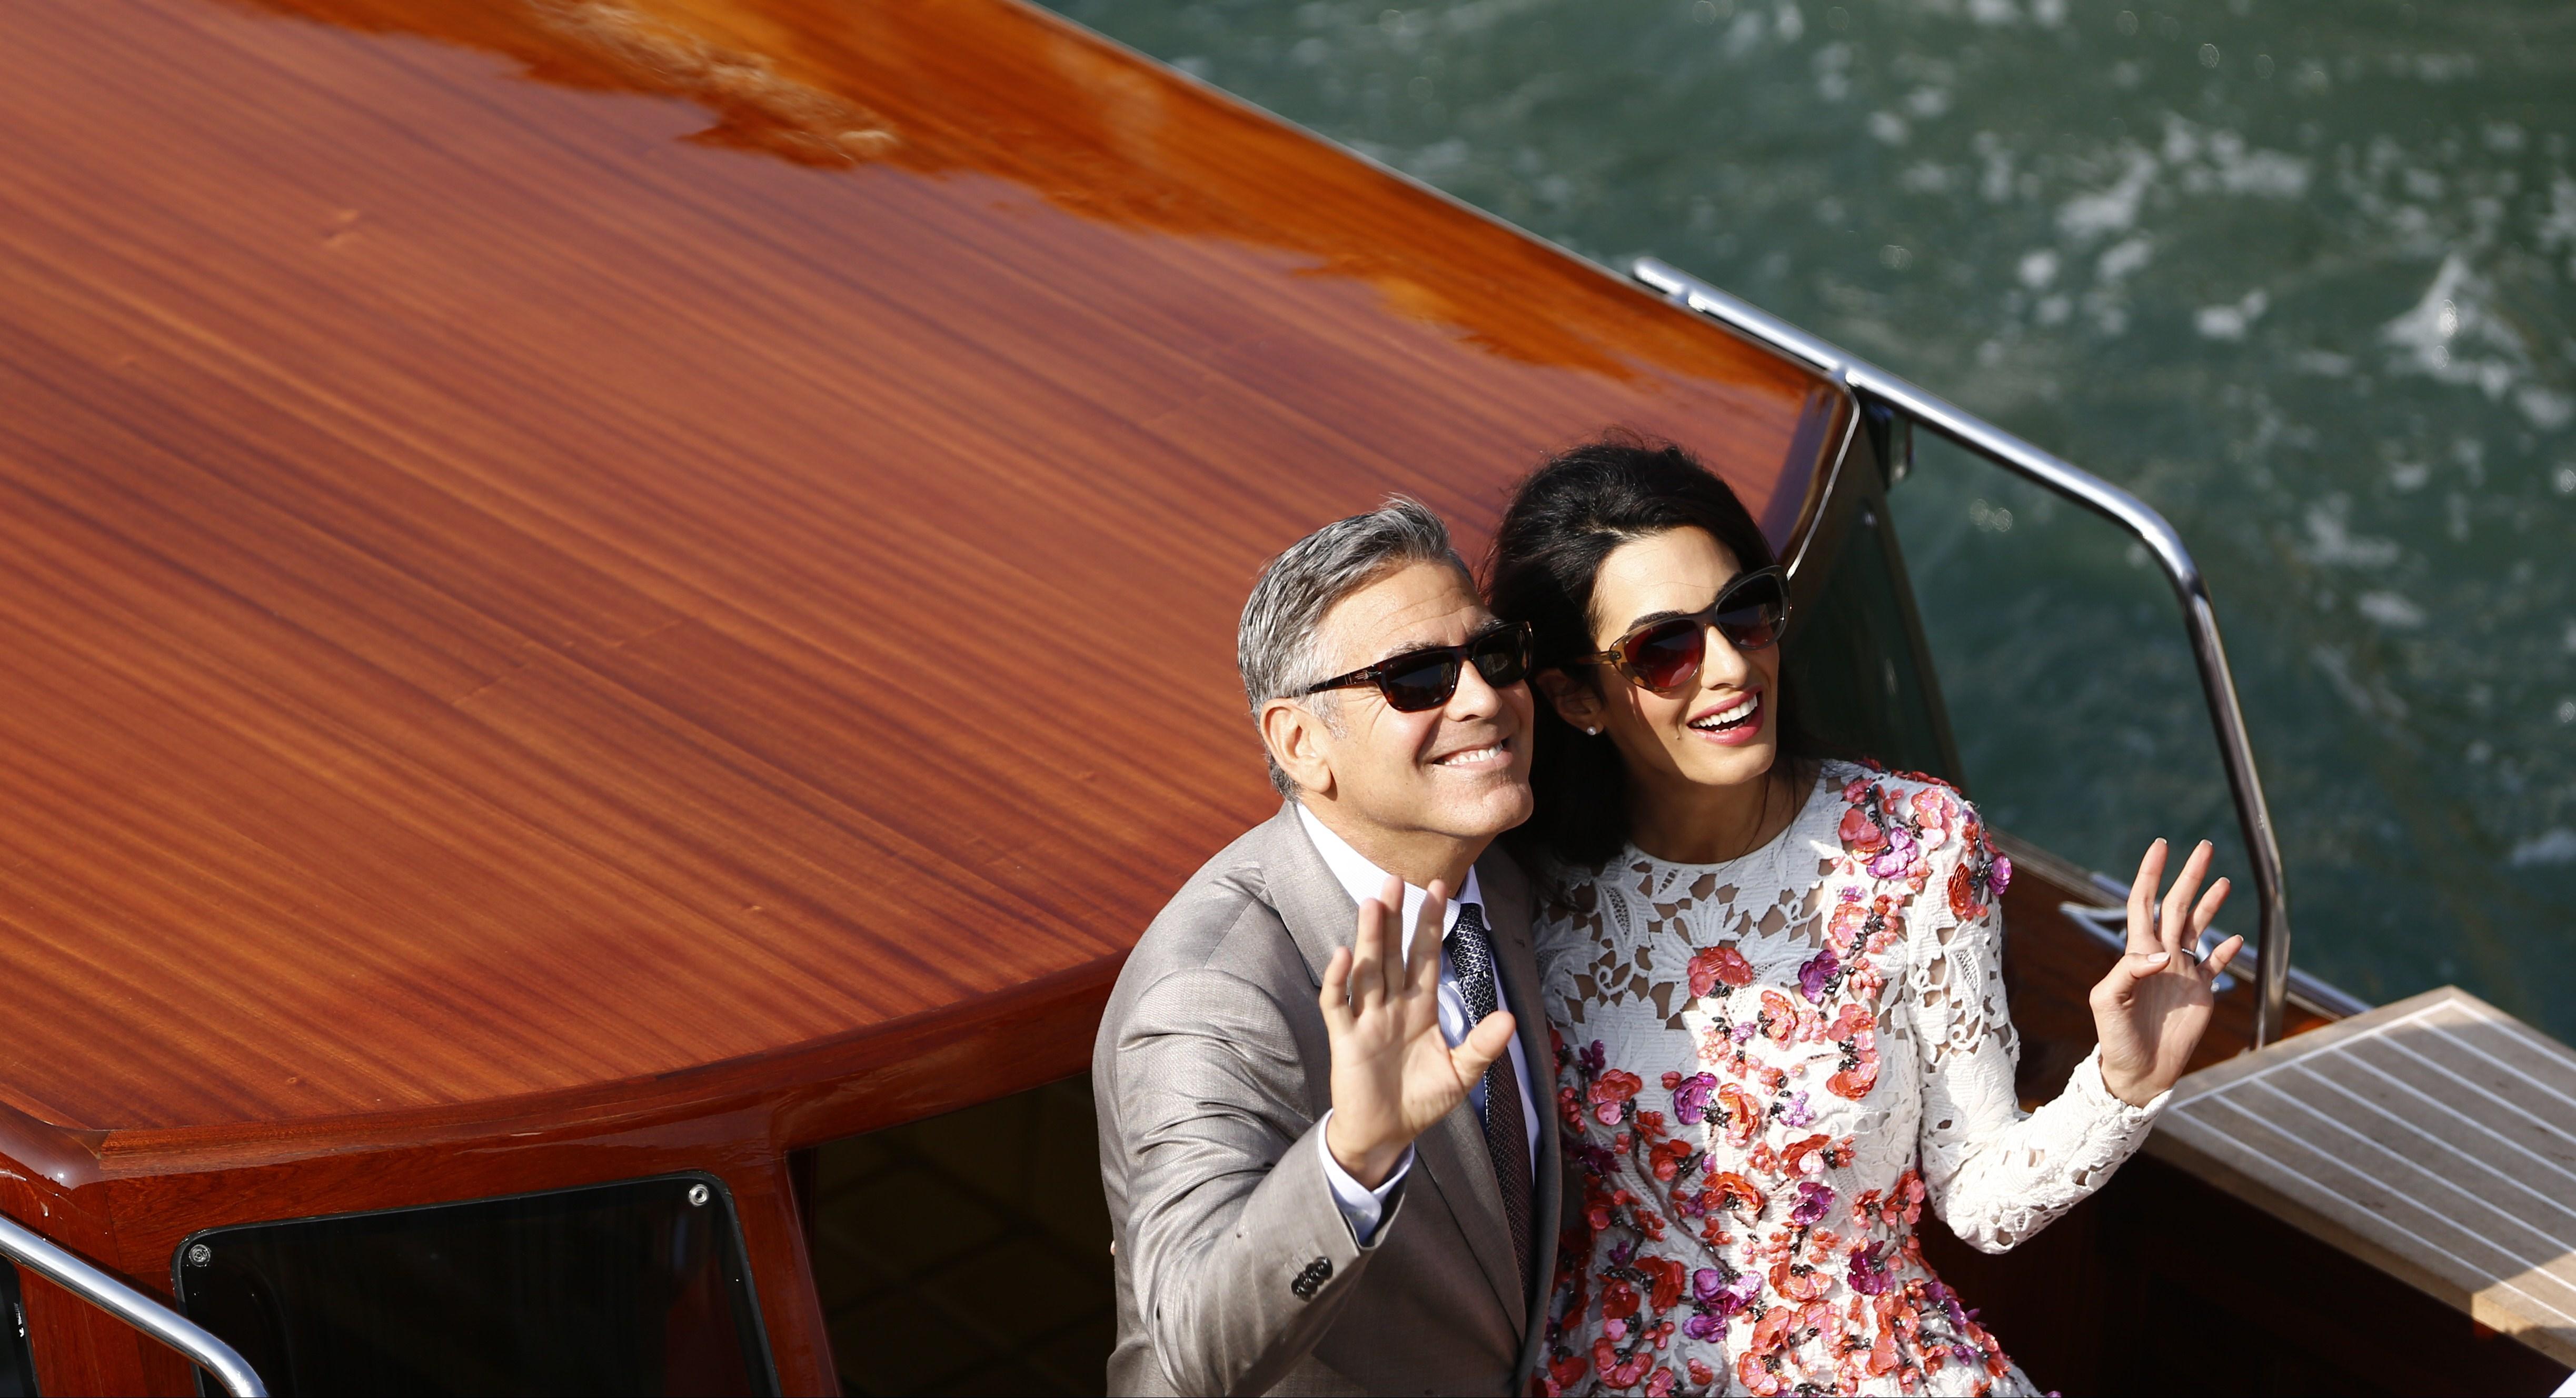 George Clooney Amal Alamuddin Step Out As Newlyweds Cbs News